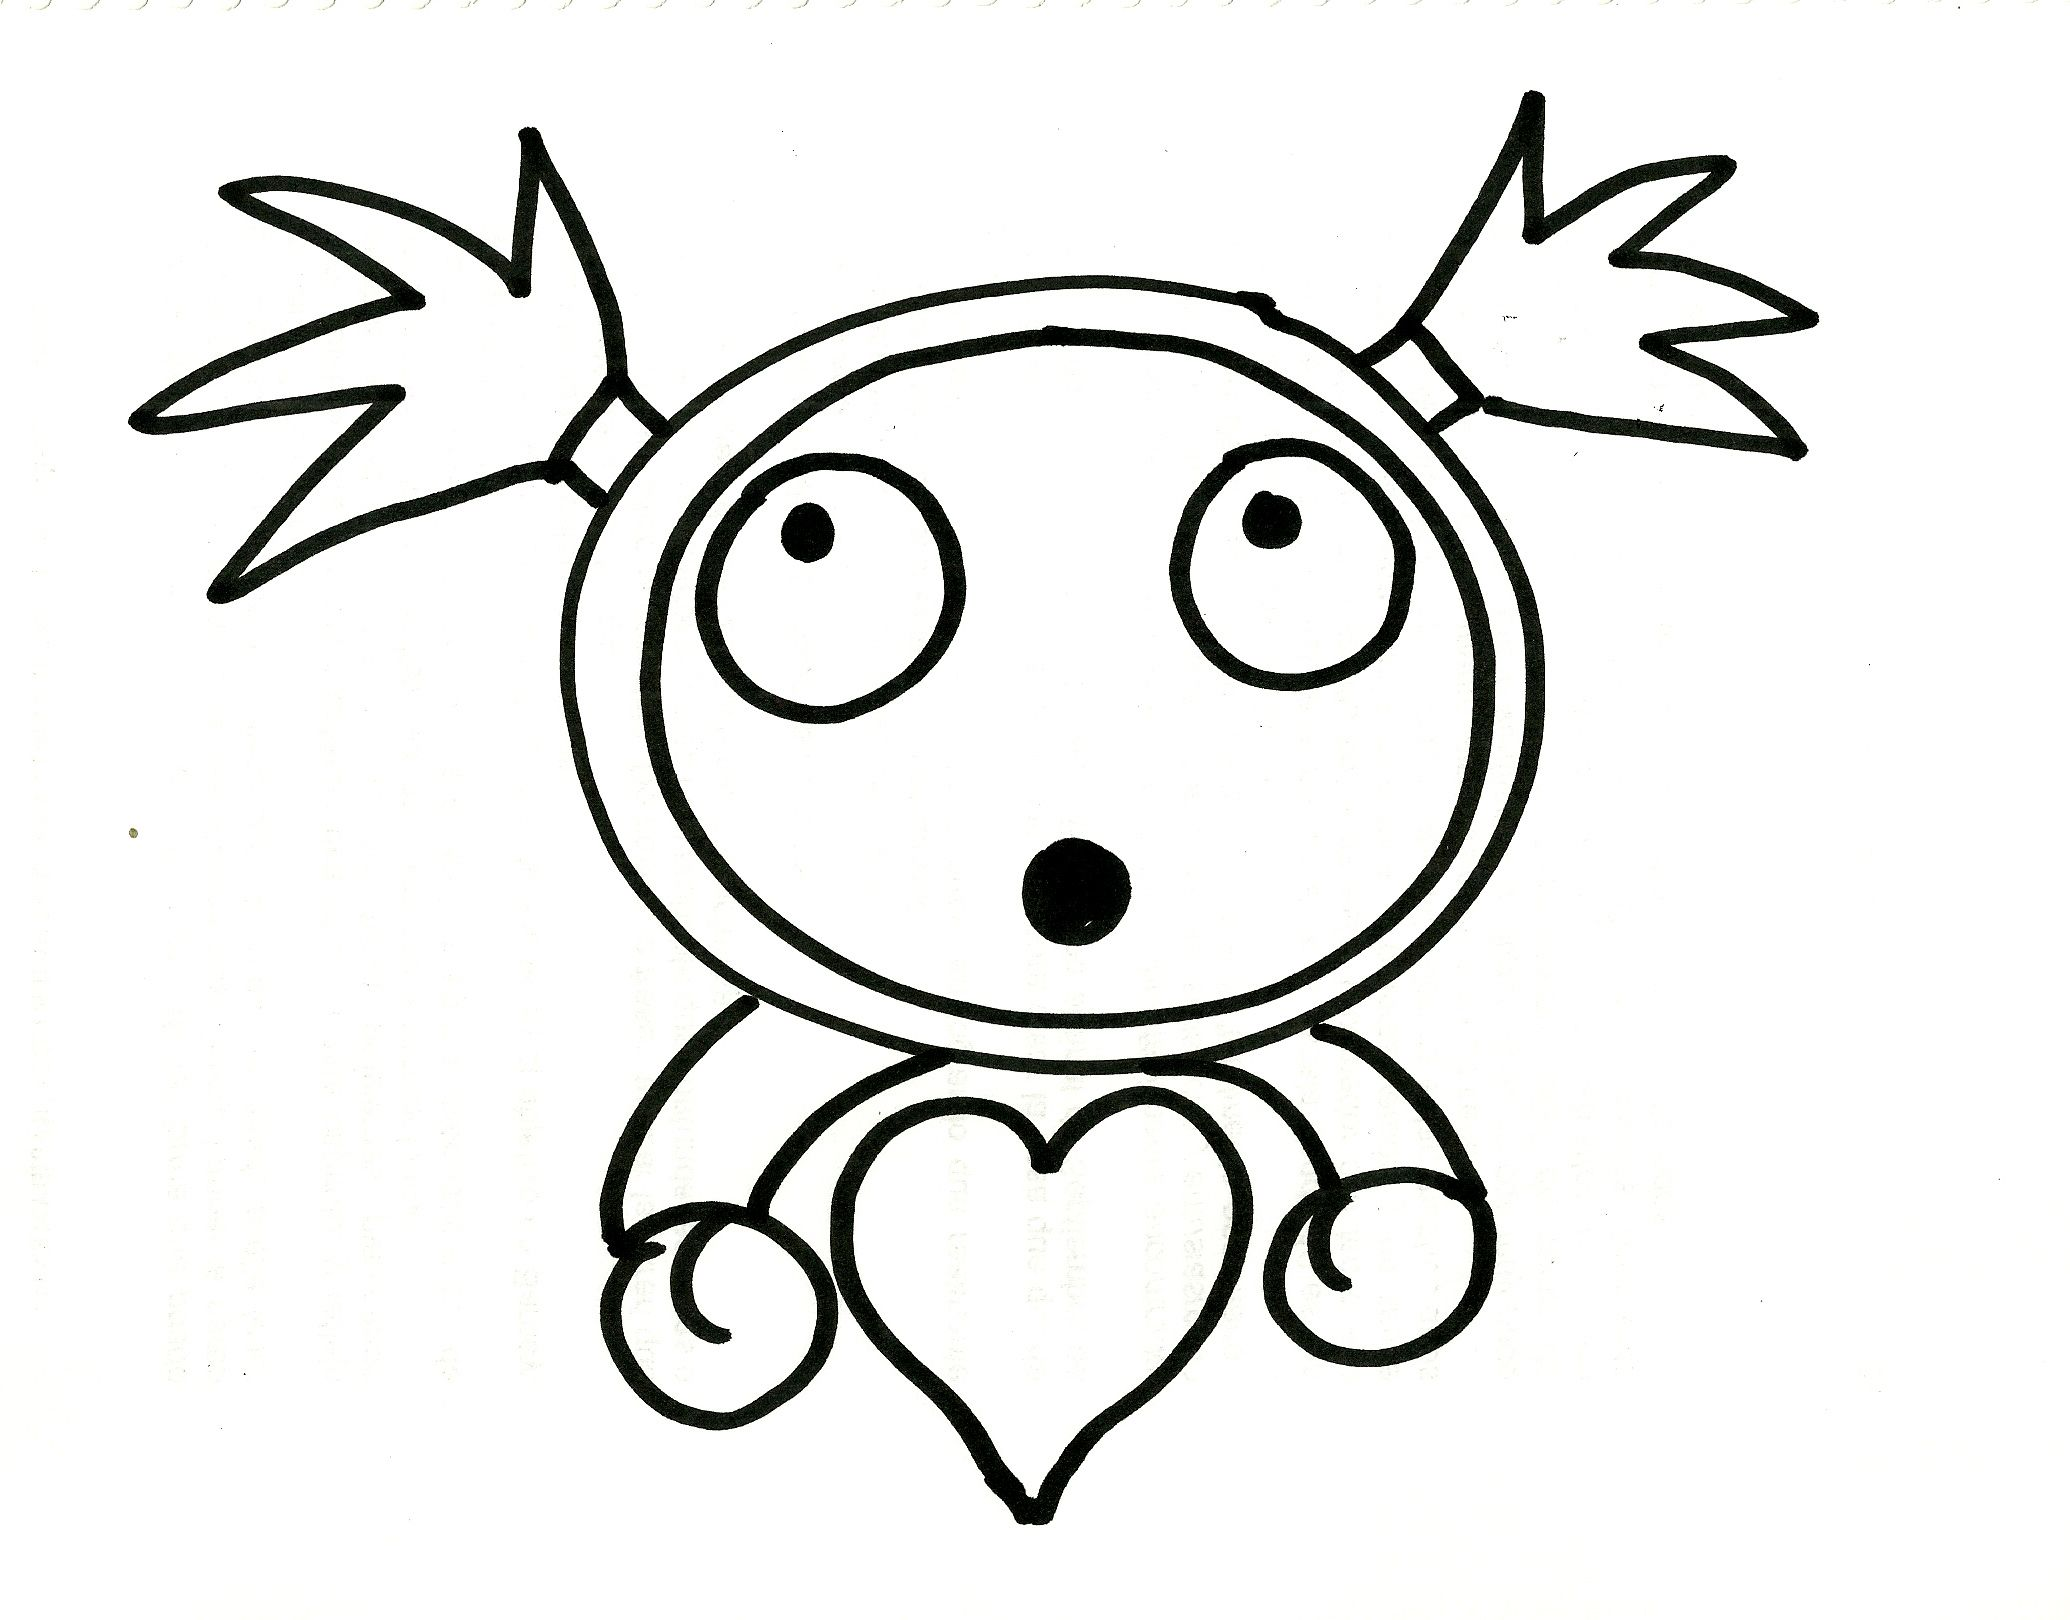 #DibujoGaru #DibujoFacilParaNiños del #canalDeDibujo para #AprenderADibujar o #AprenderAPintar de #TallerArteLibre https://www.youtube.com/user/exitoparatodos/